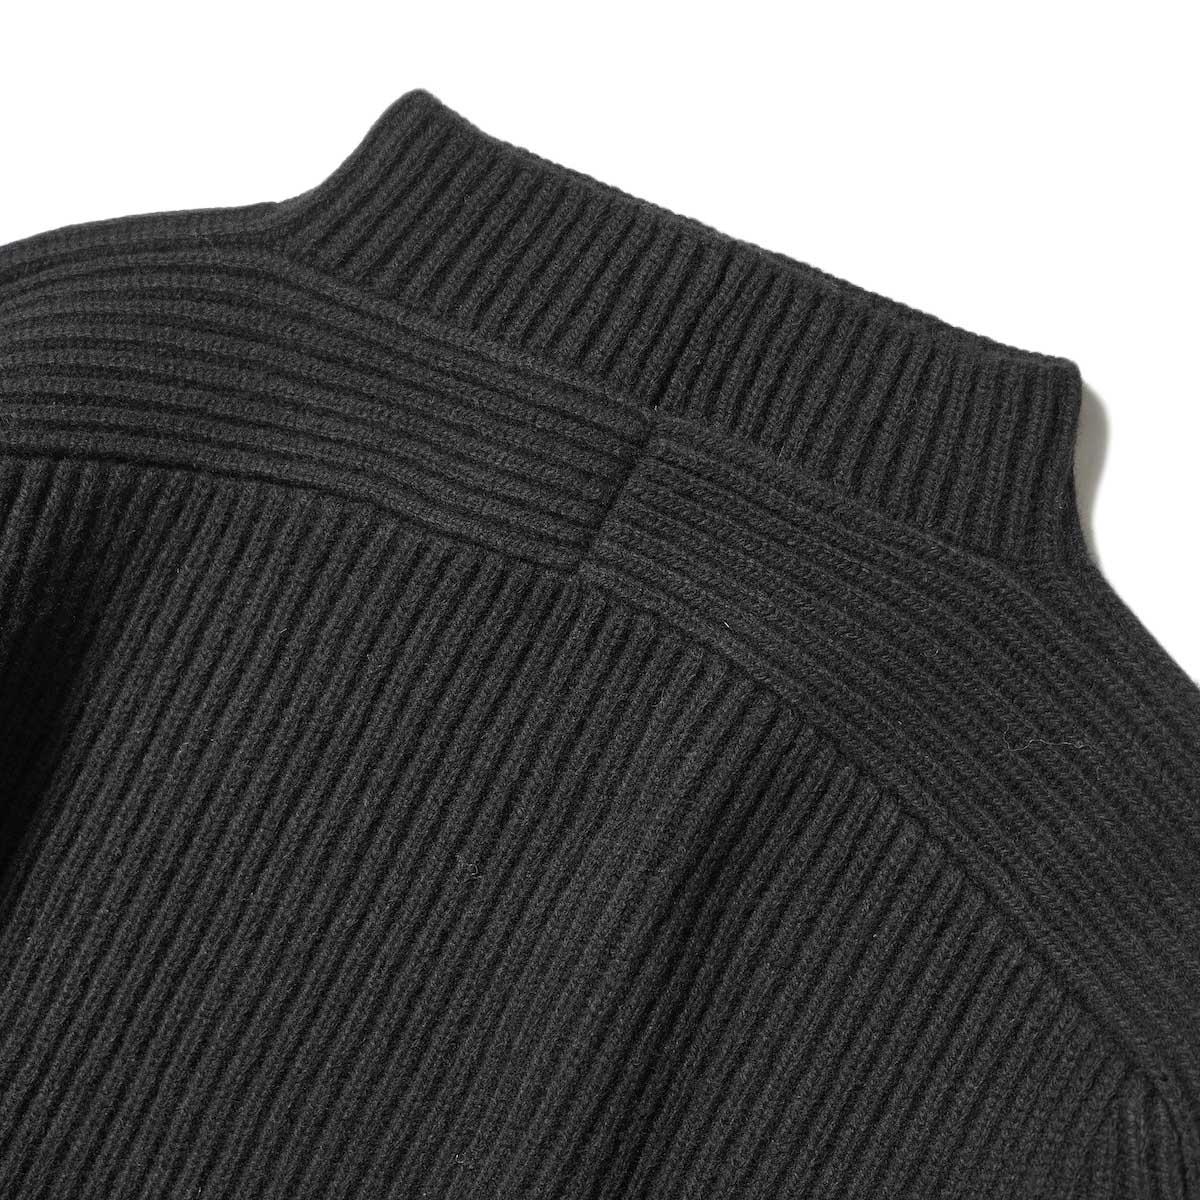 YLEVE / EX FINE MERINOWOOL KN P/O (Black) 背面ネック